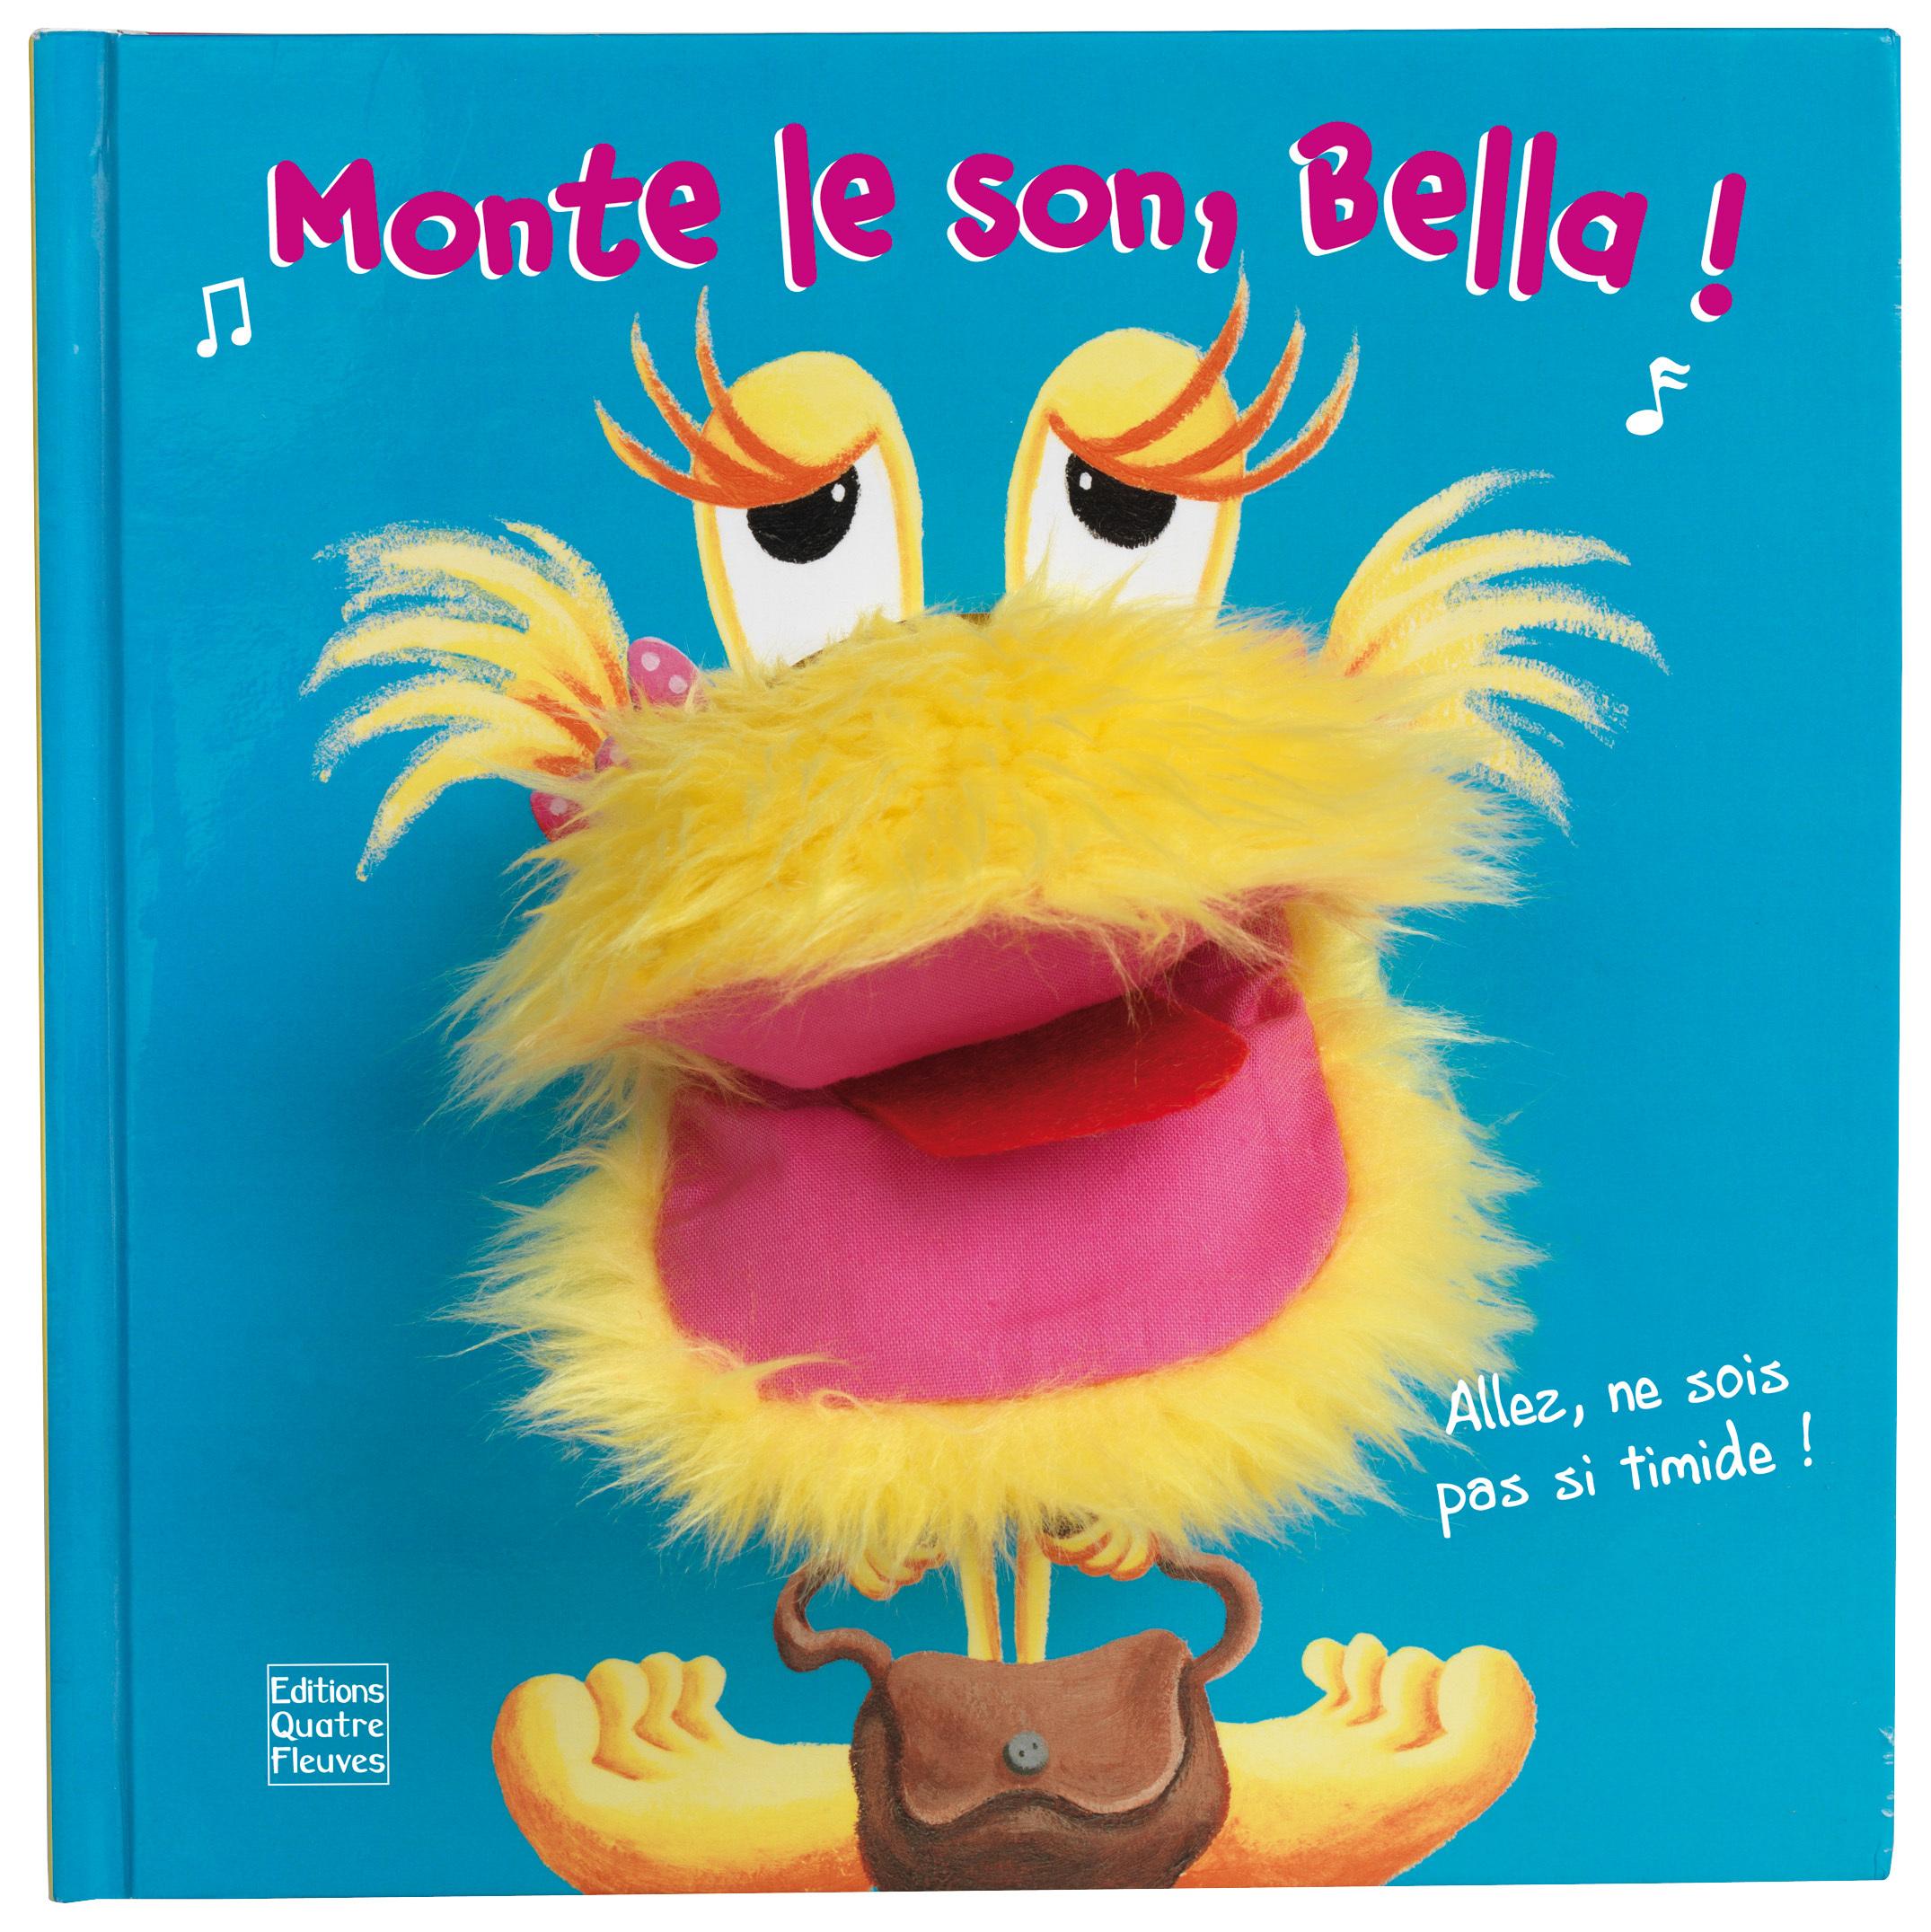 MONTE LE SON BELLA !